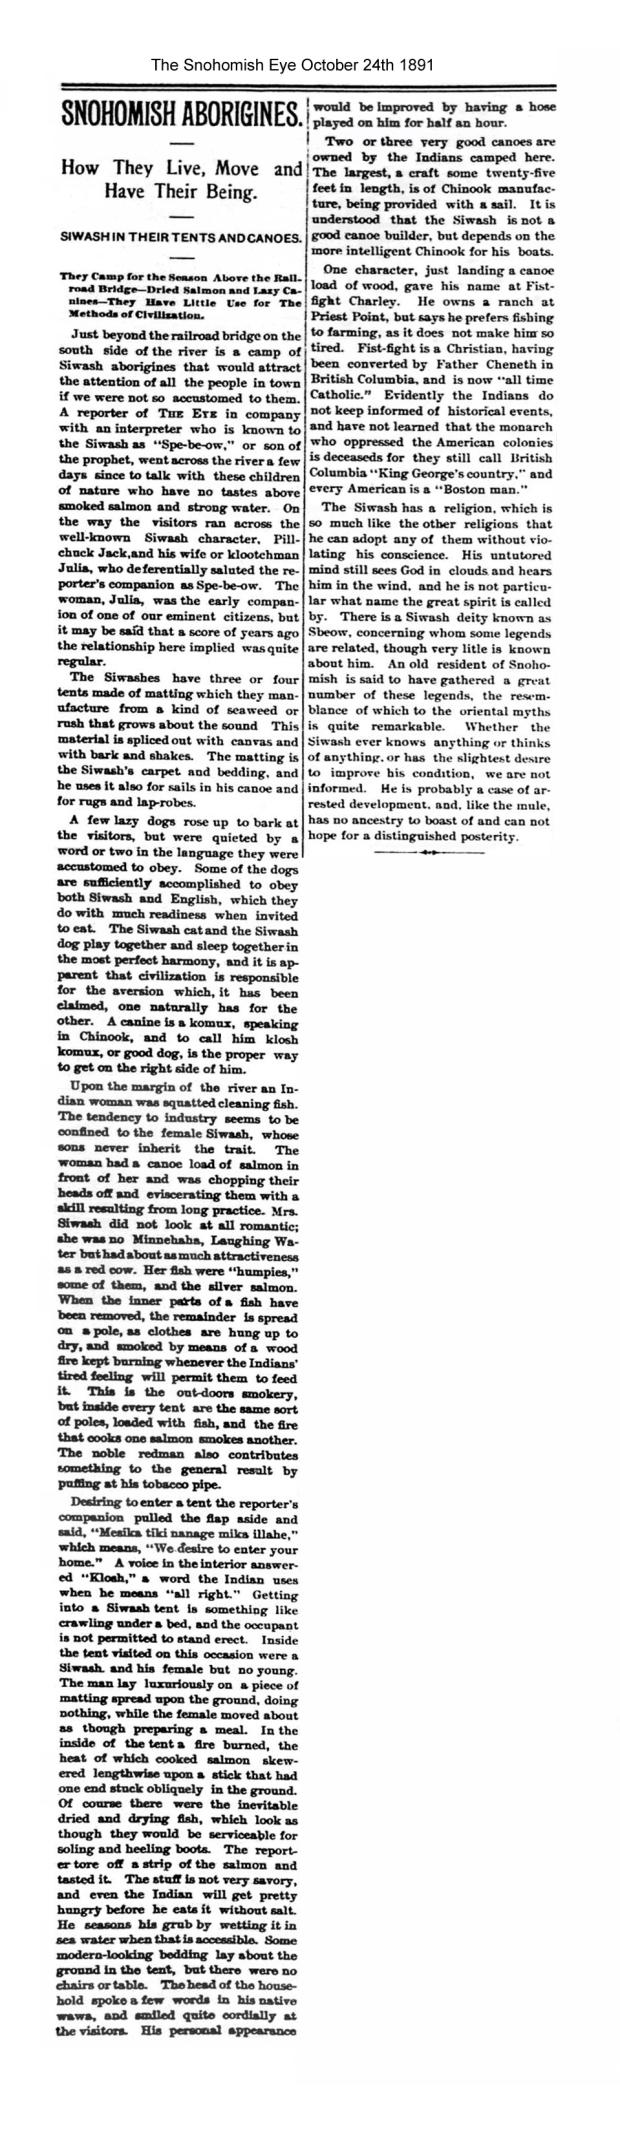 Pilchuck jack and julia siwash Snohomish Eye oct 24 1891